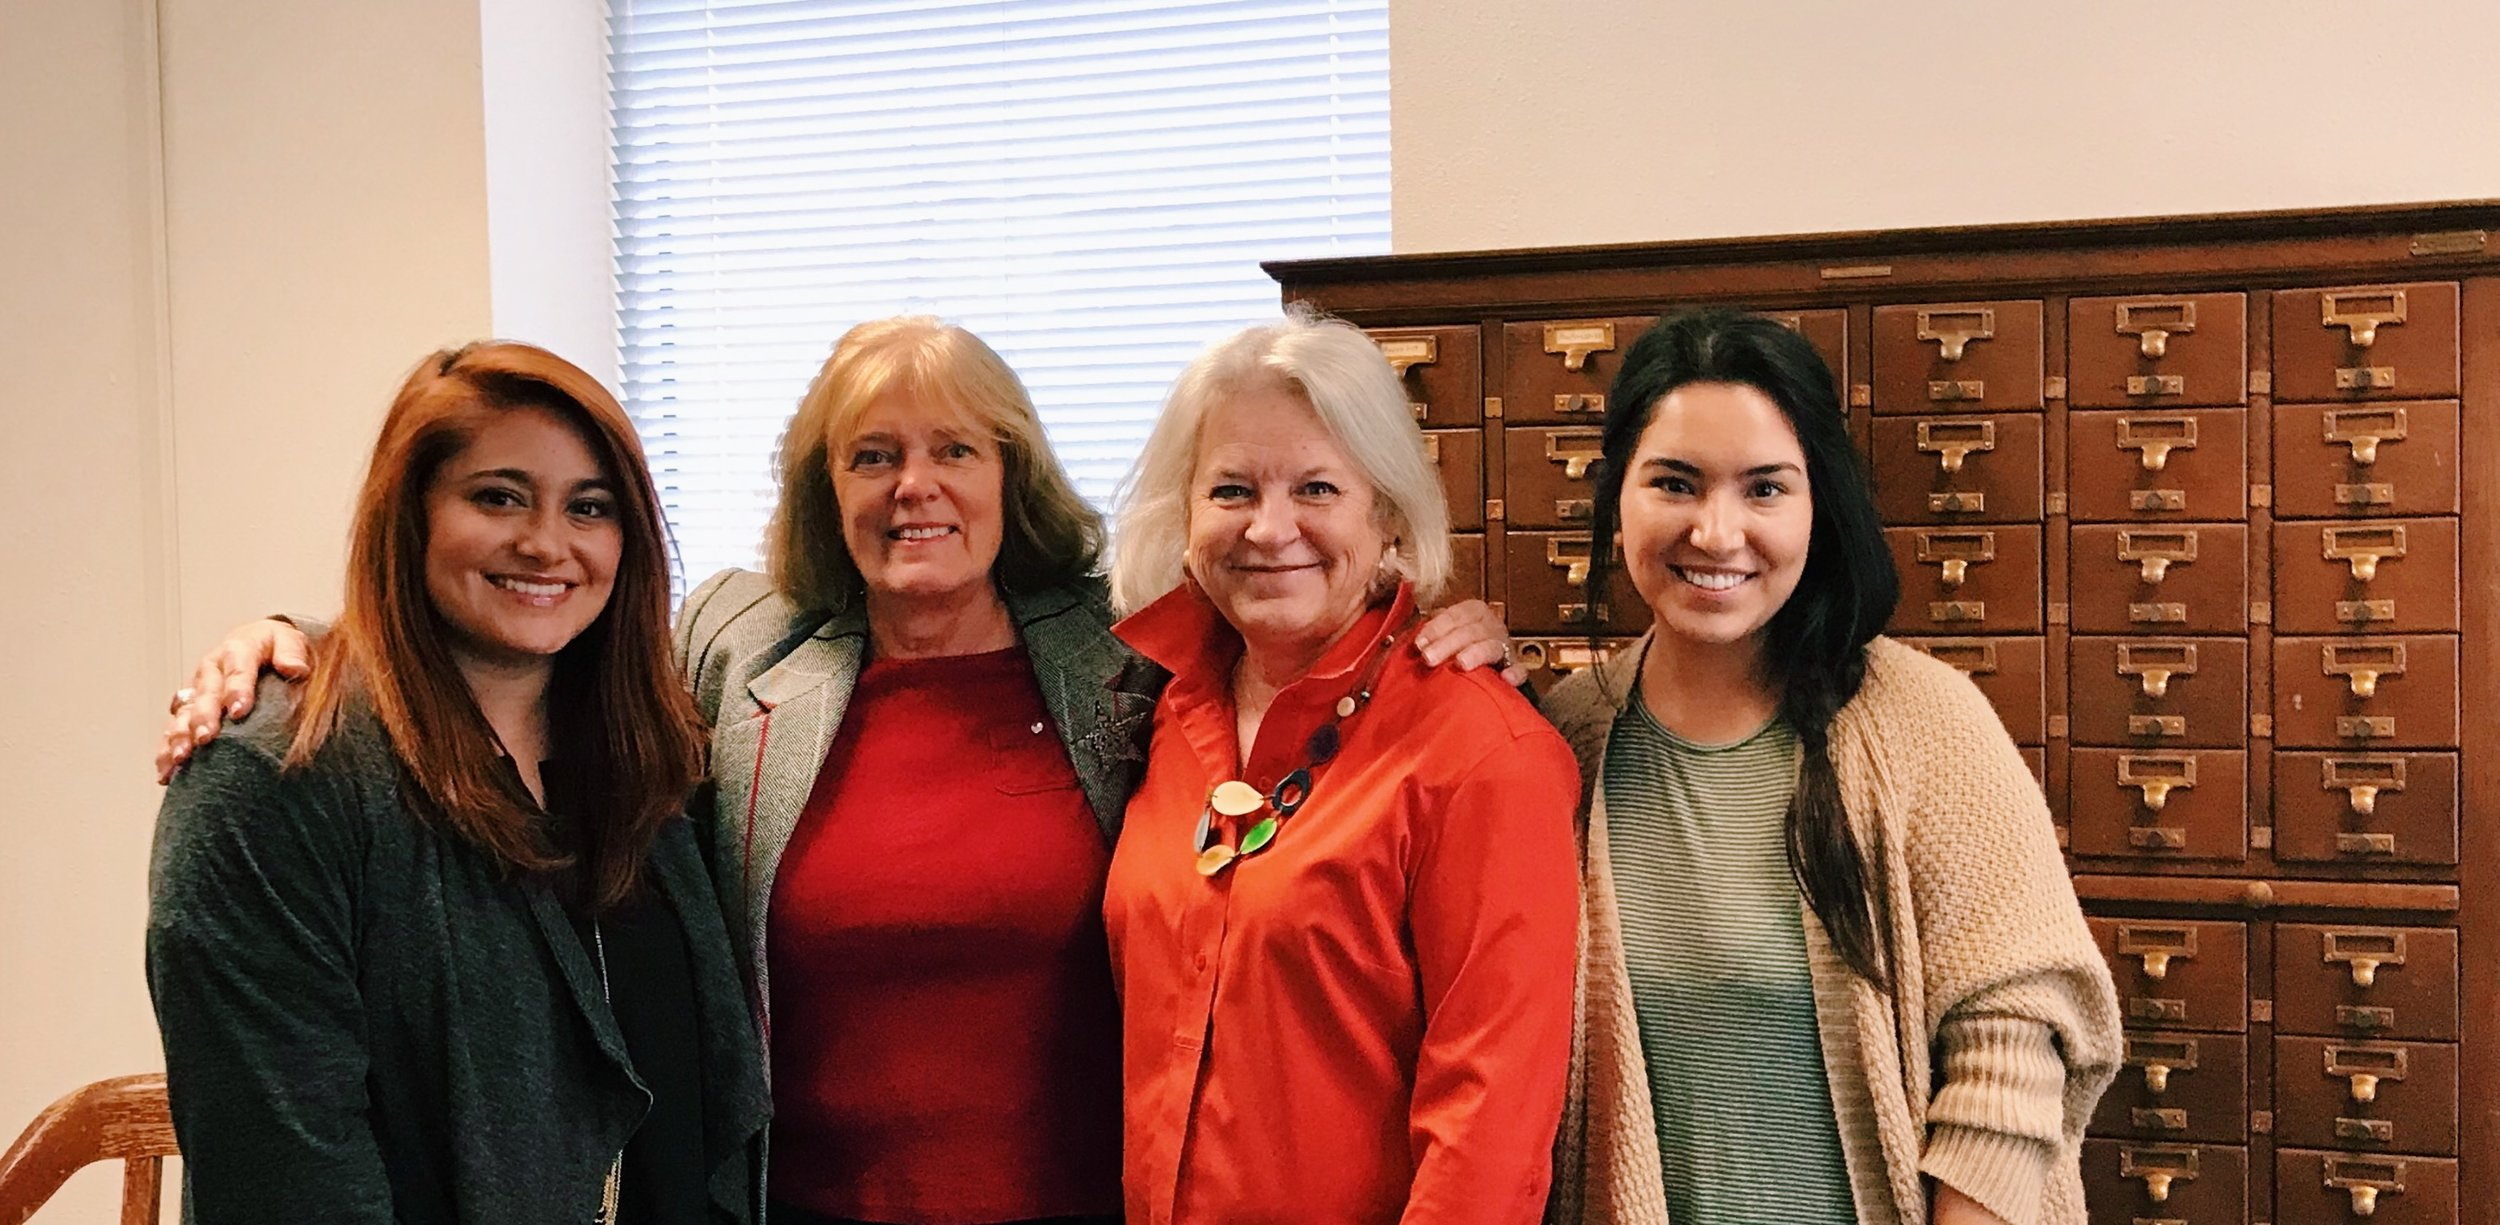 Left to right: Aysa Province, Toni Turner, Karen Knox, Mayra Téllez